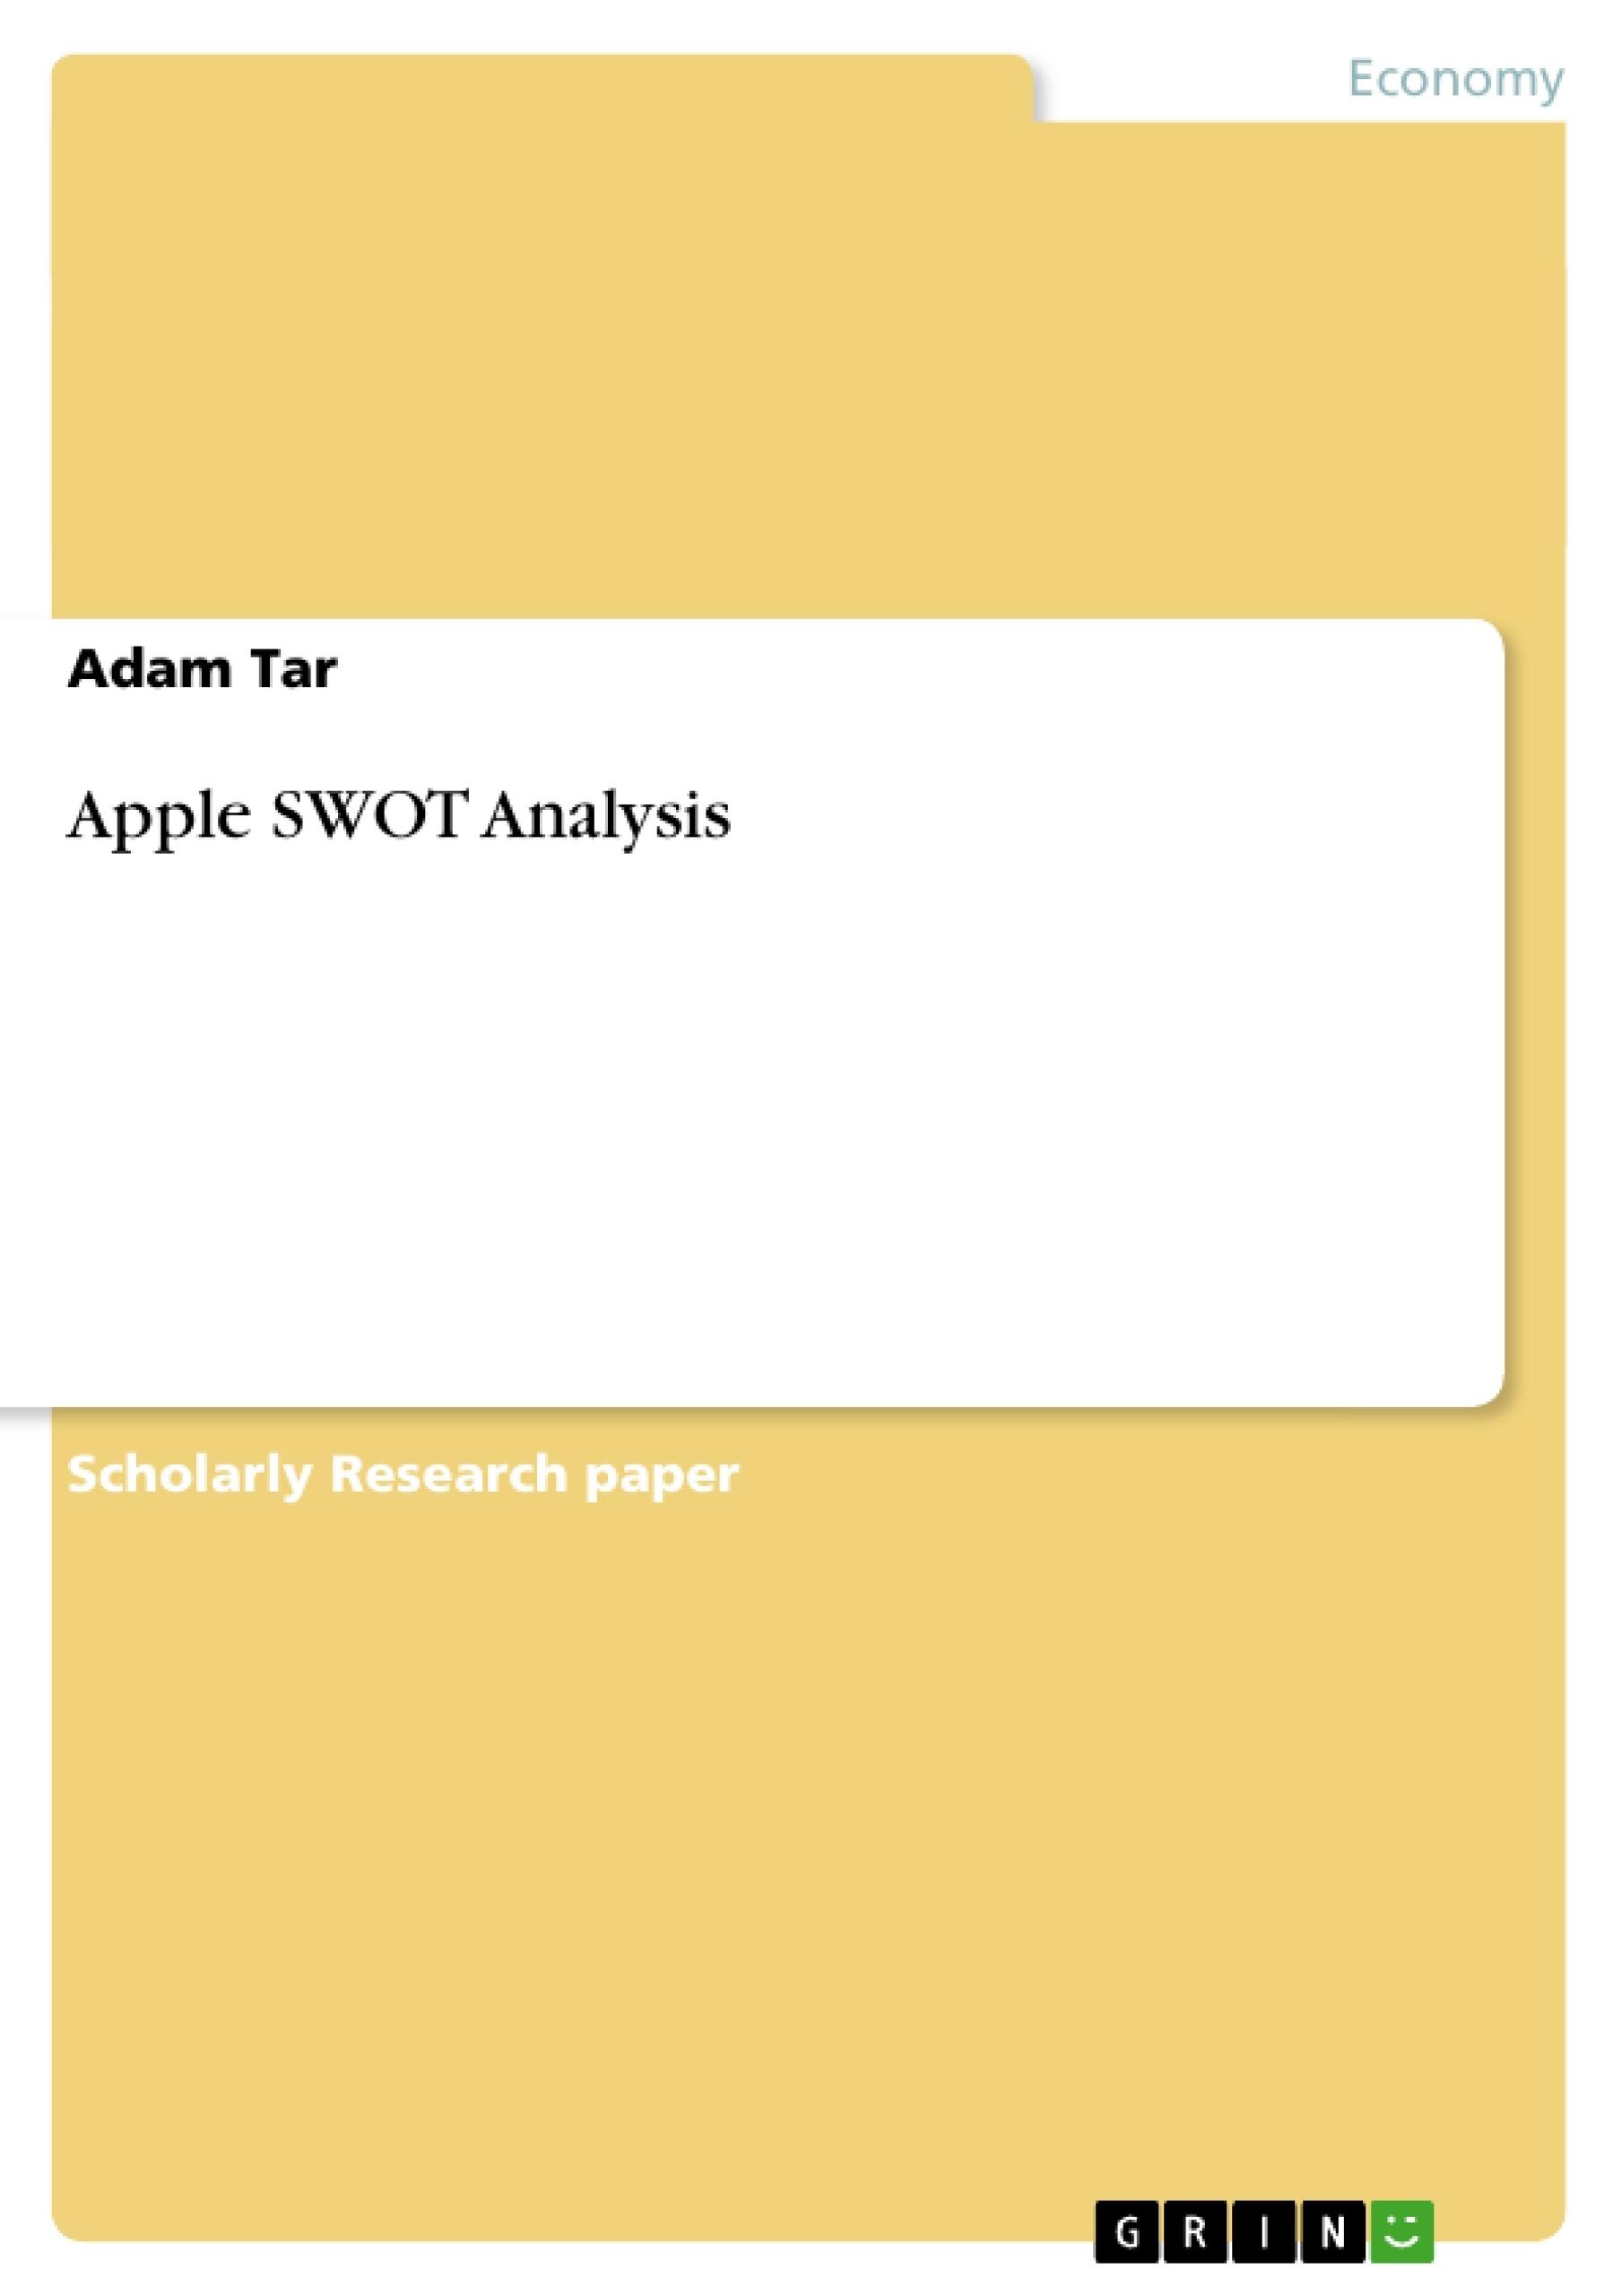 Title: Apple SWOT Analysis